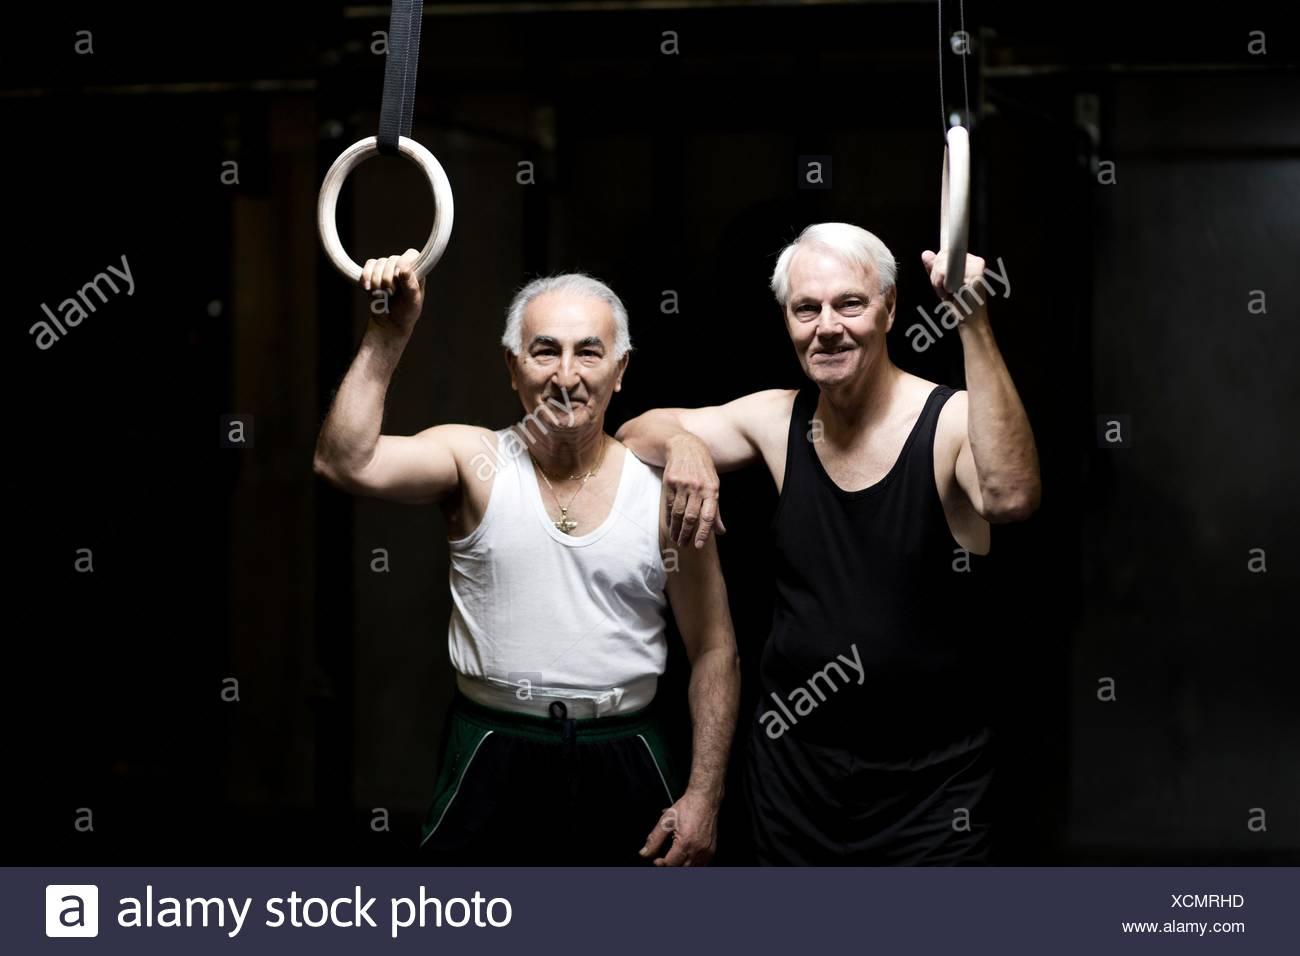 Portrait of two senior men holding gym rings in dark gym - Stock Image